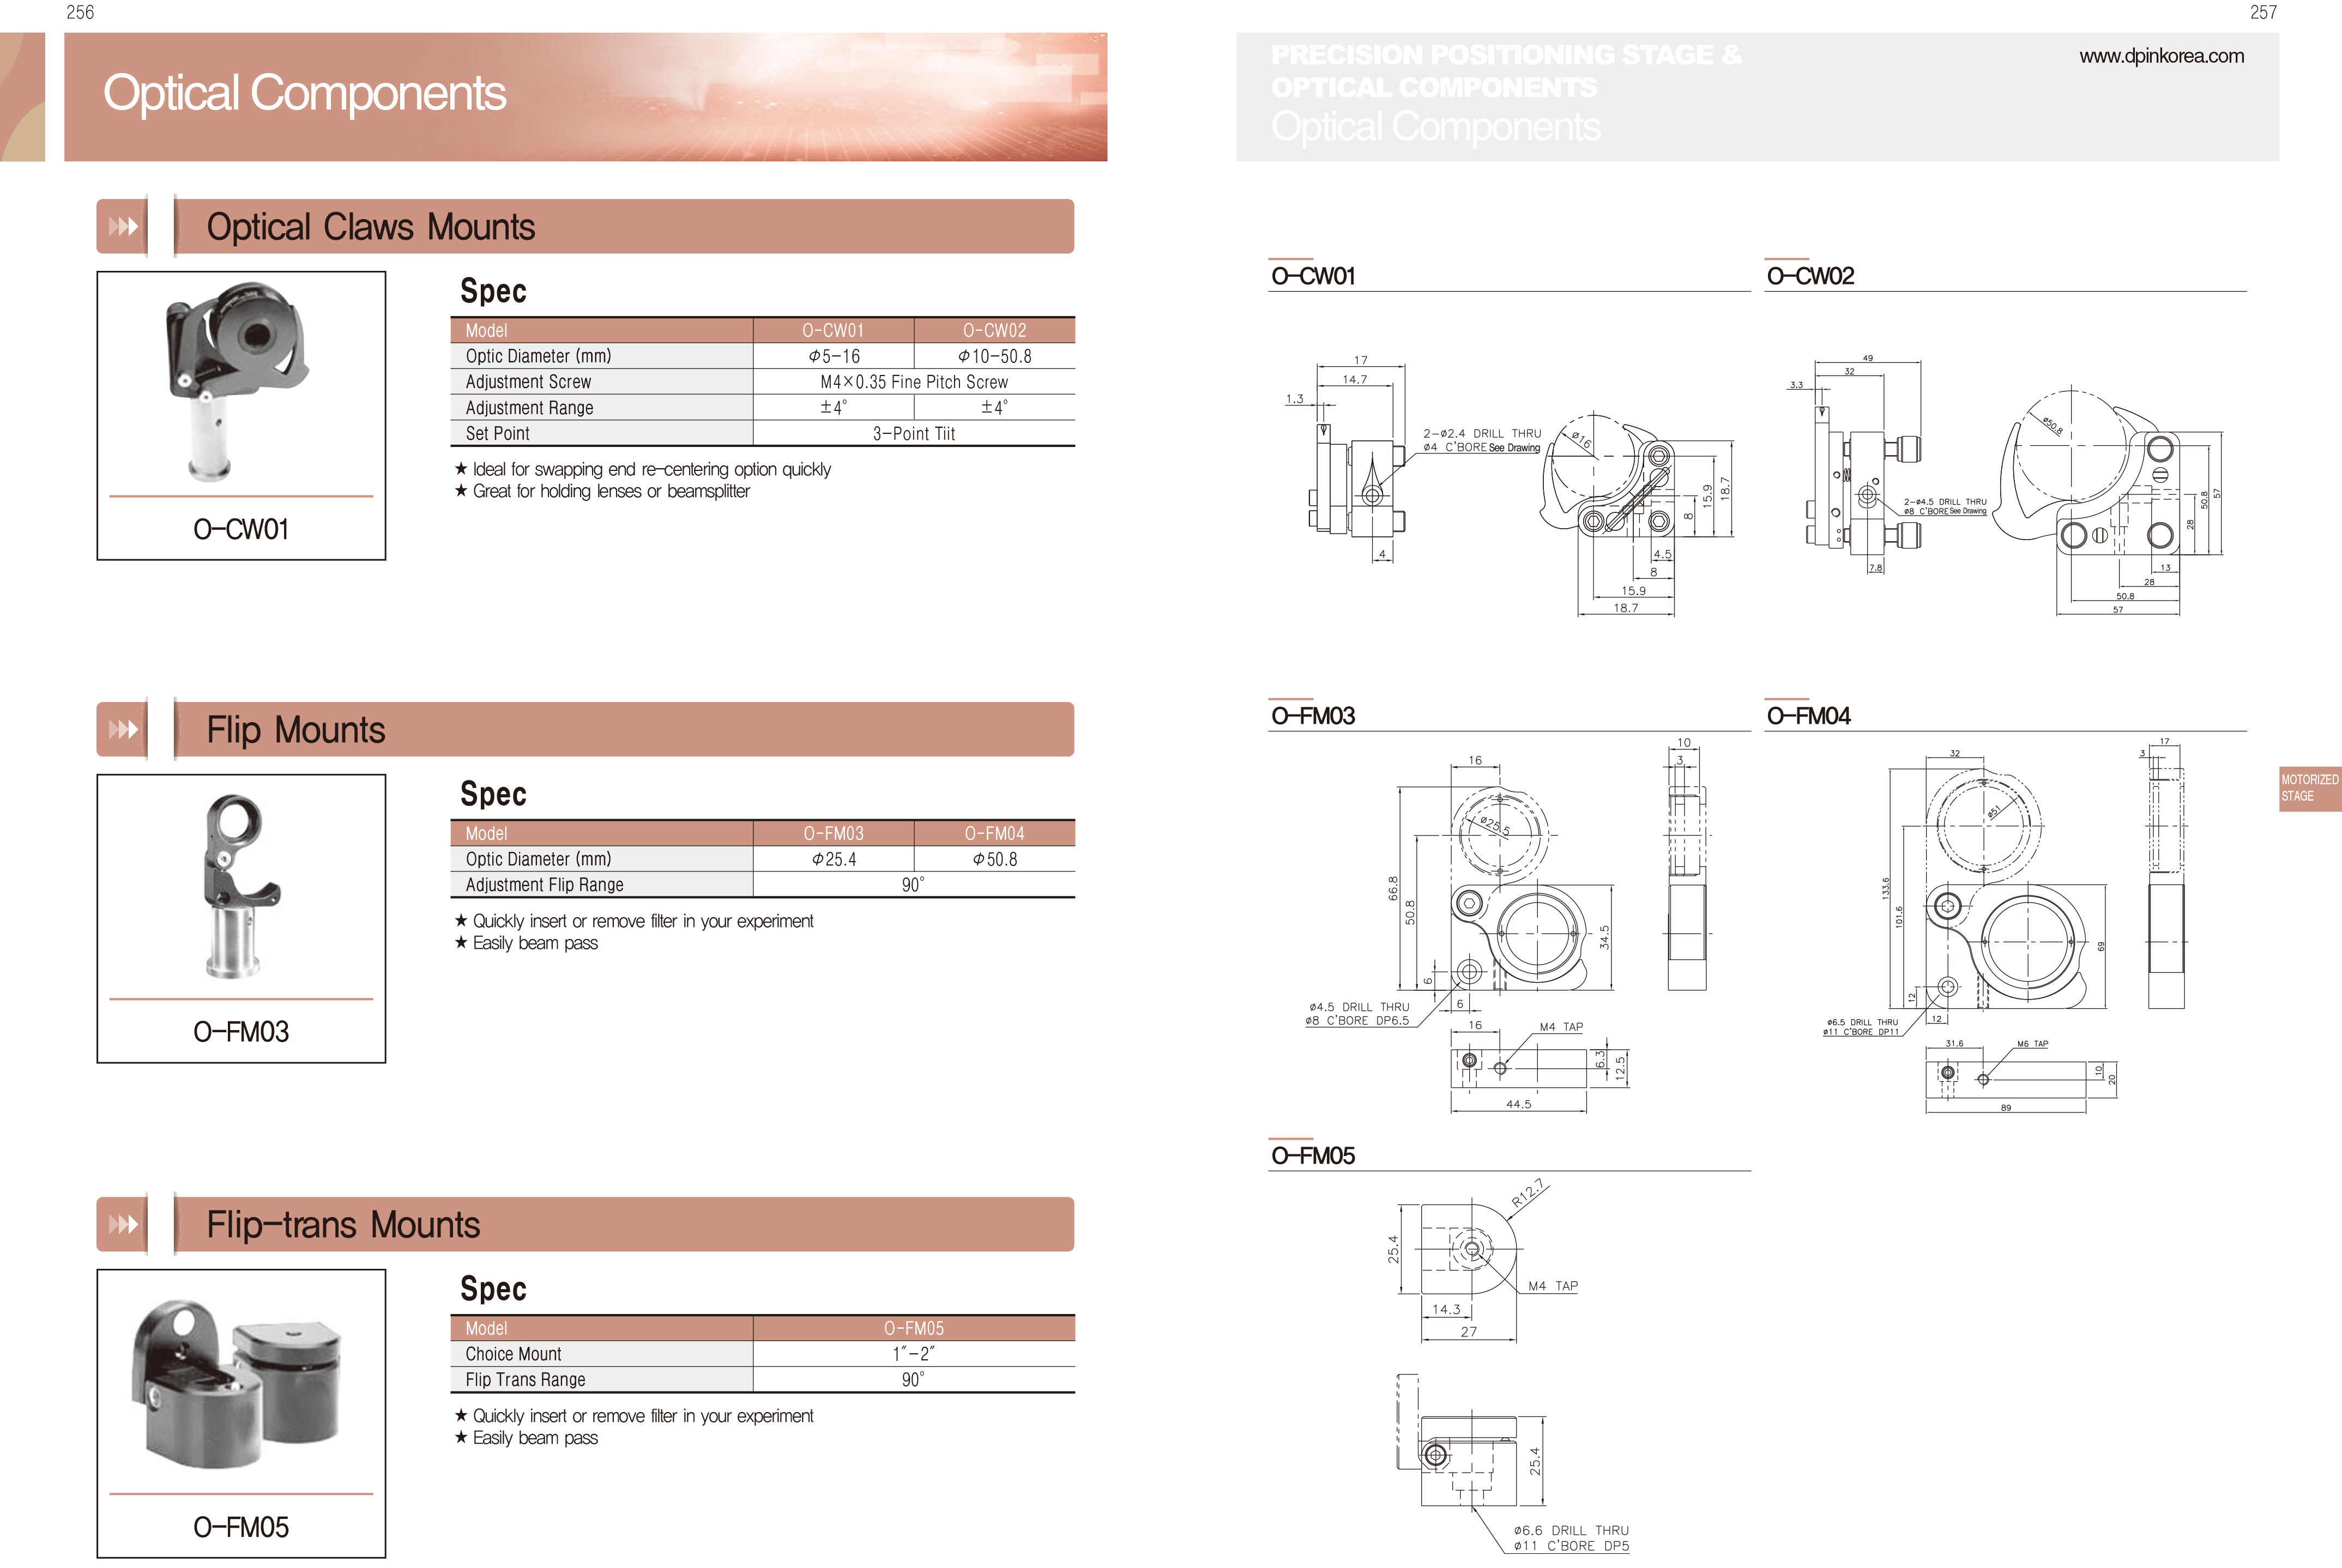 DPIN-Optical-光學元件-6